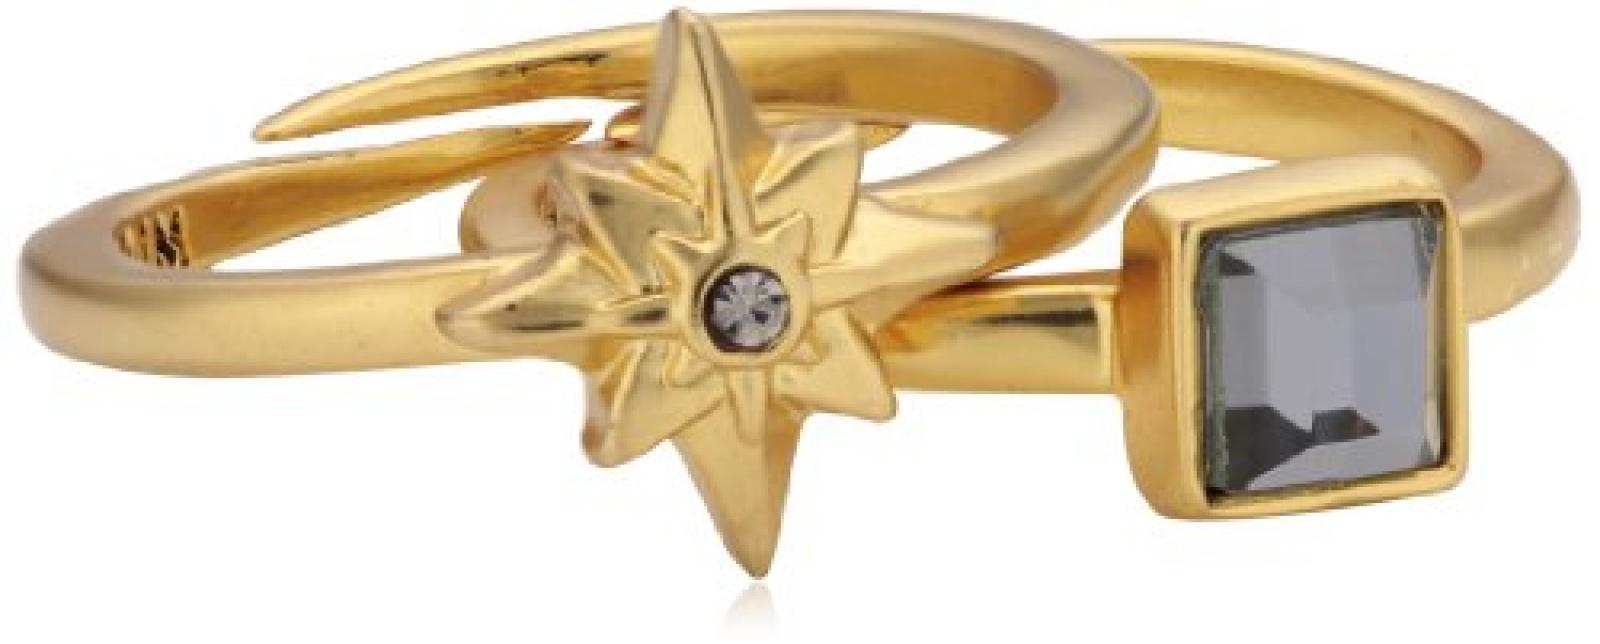 Pilgrim Jewelry Damen-Ring Messing Kristall Glaskristall Starcross grau Gr. 191342104